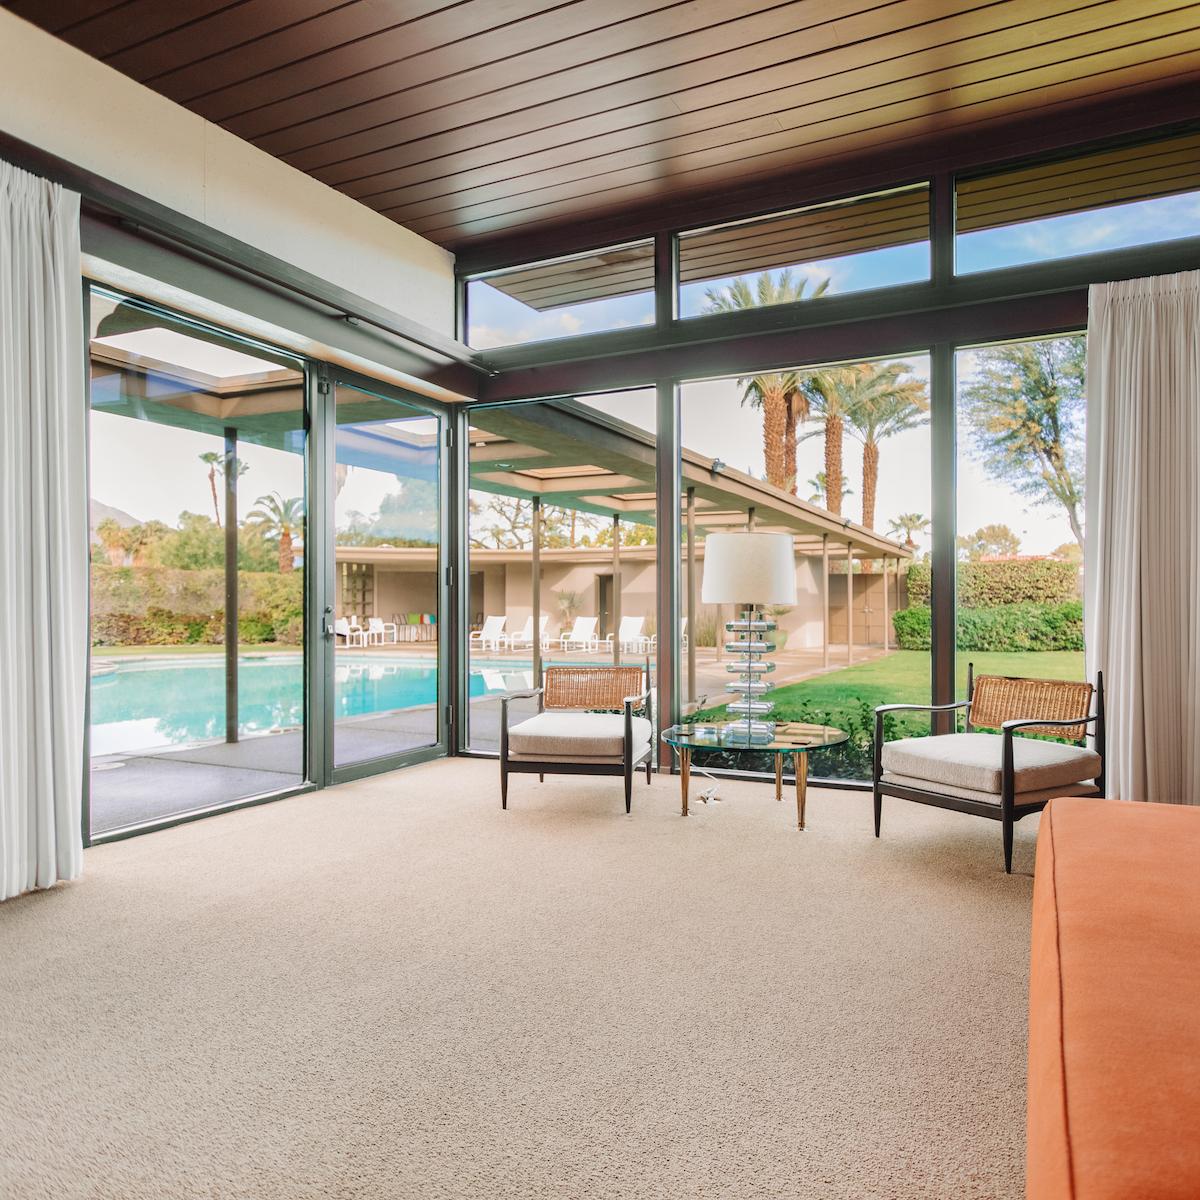 Luxury Vacation Homes: Frank Sinatra's Original Palm Springs Estate